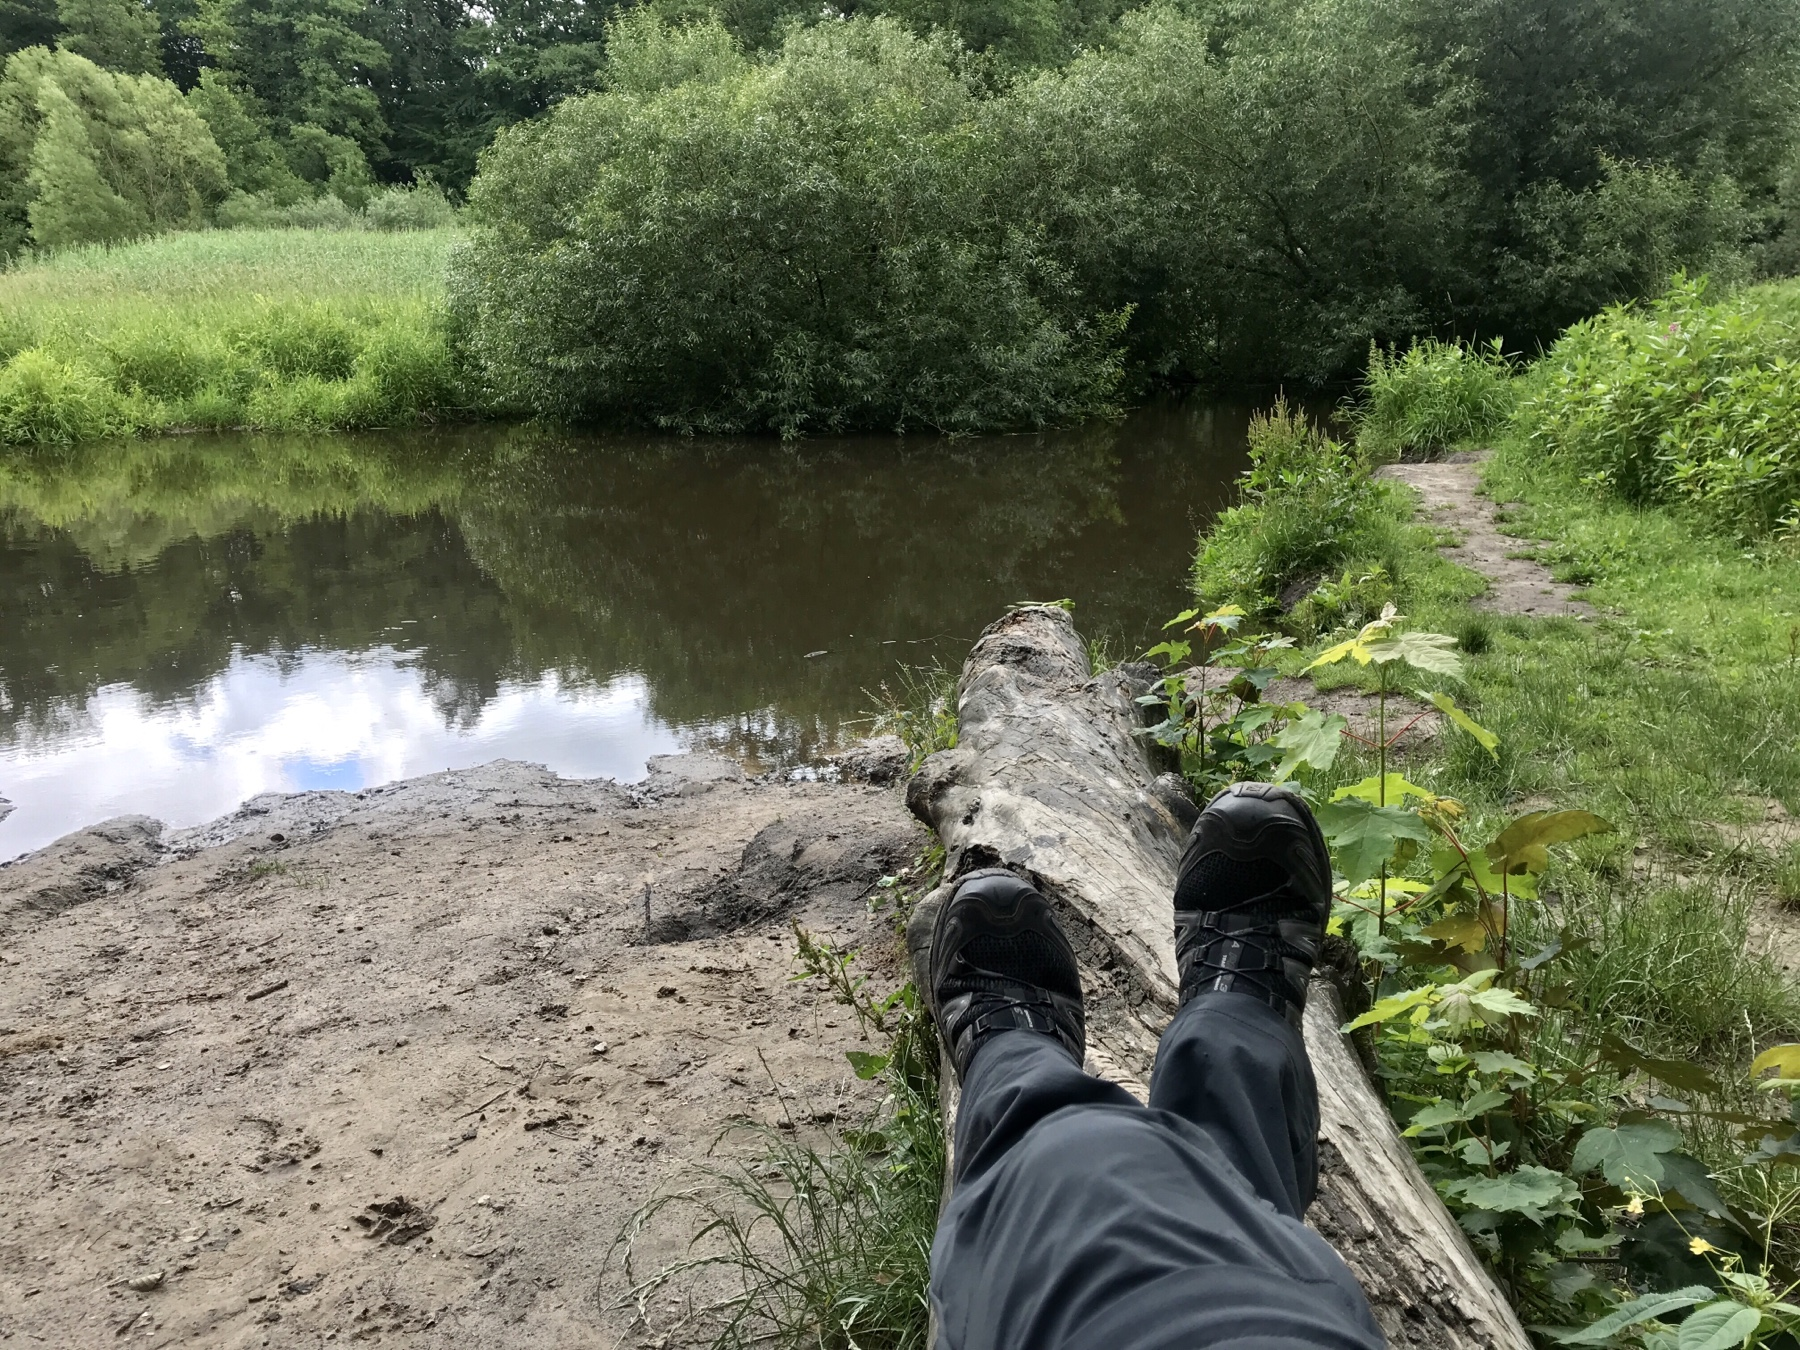 Päuschen an der Bille, Stormarnweg Etappe 1 Reinbek Großensee